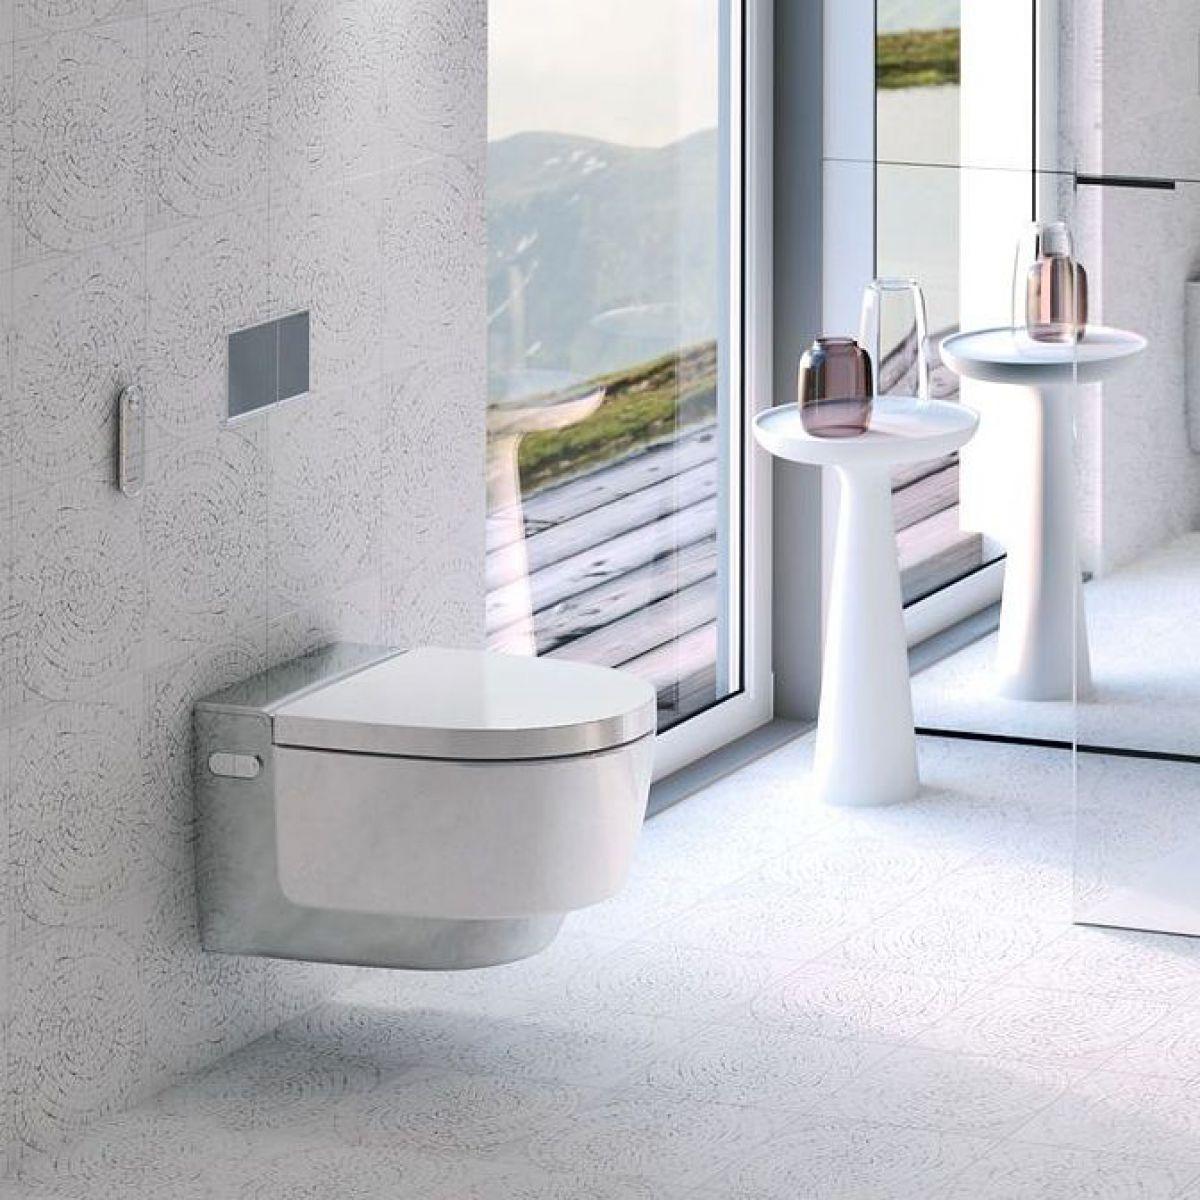 geberit aquaclean mera classic shower toilet uk bathrooms. Black Bedroom Furniture Sets. Home Design Ideas